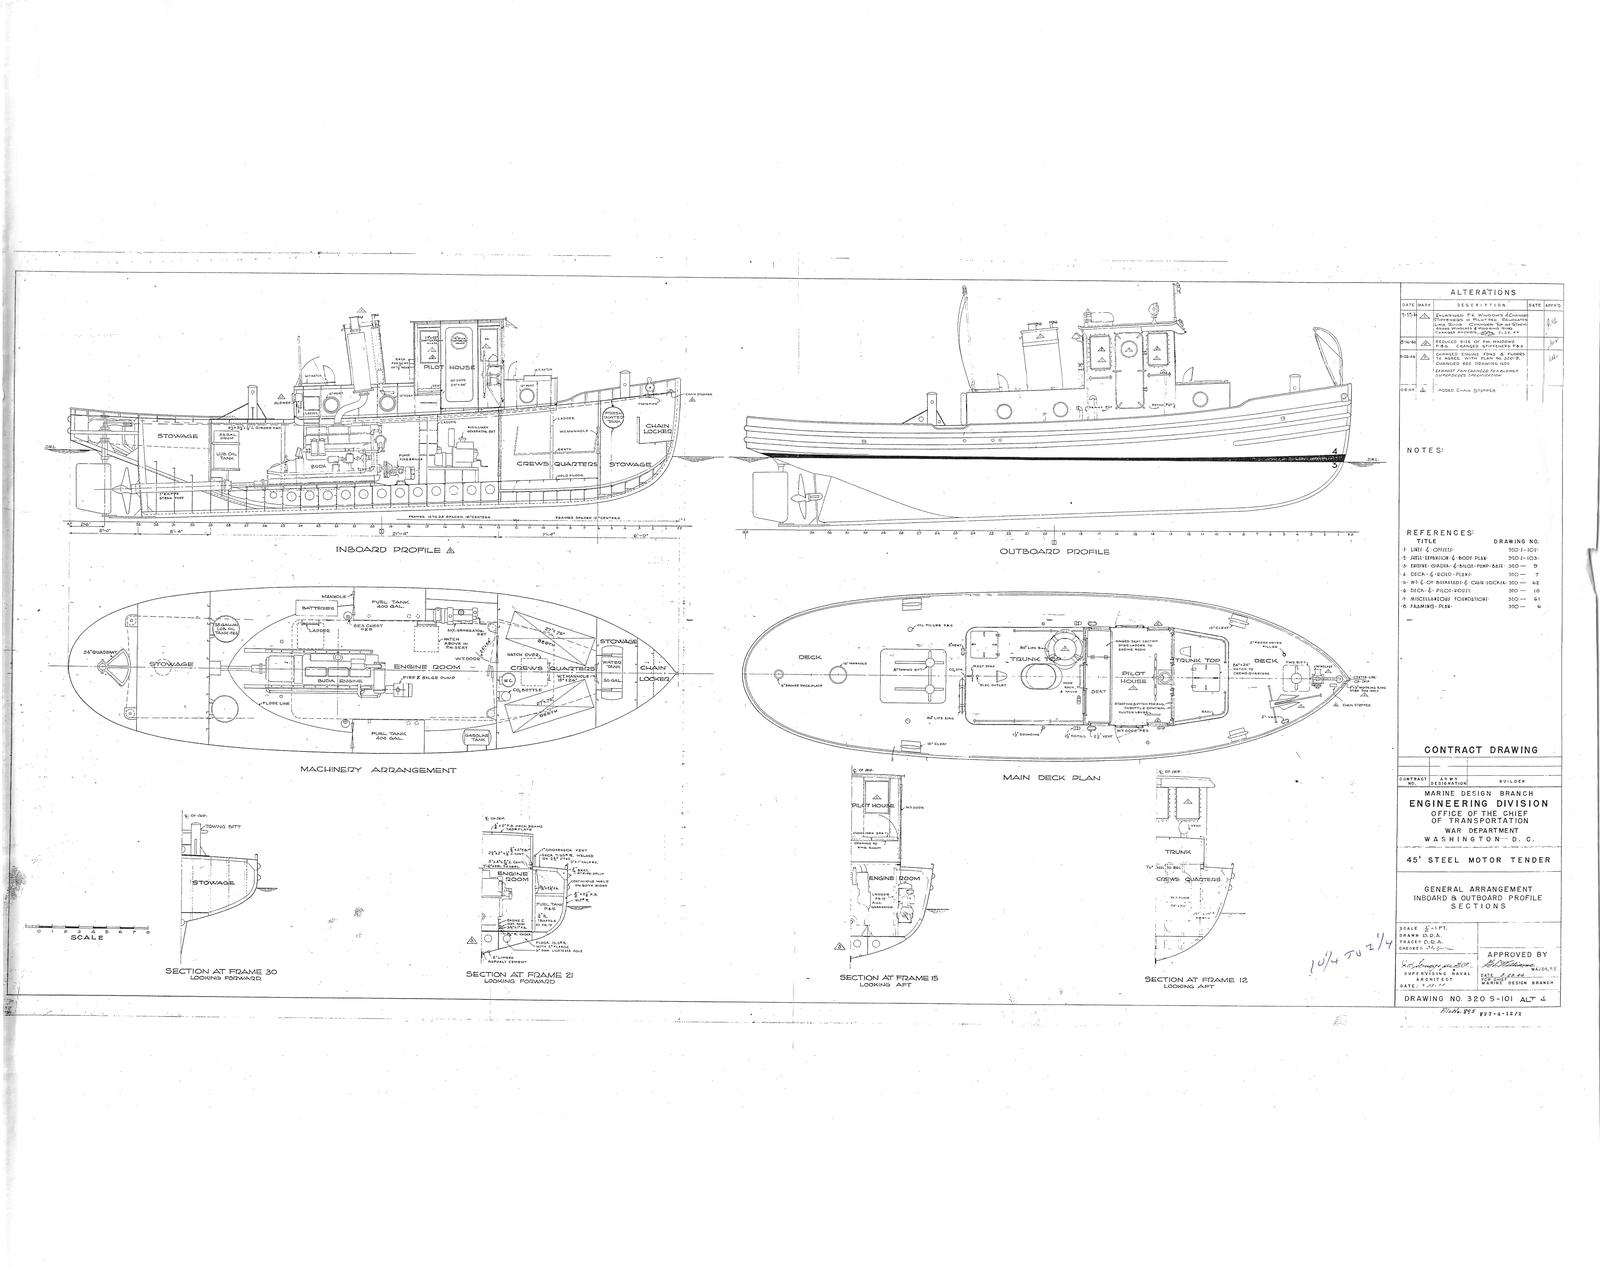 General Arrangement of Inboard & Outboard Profile for 45' Steel Motor Tender